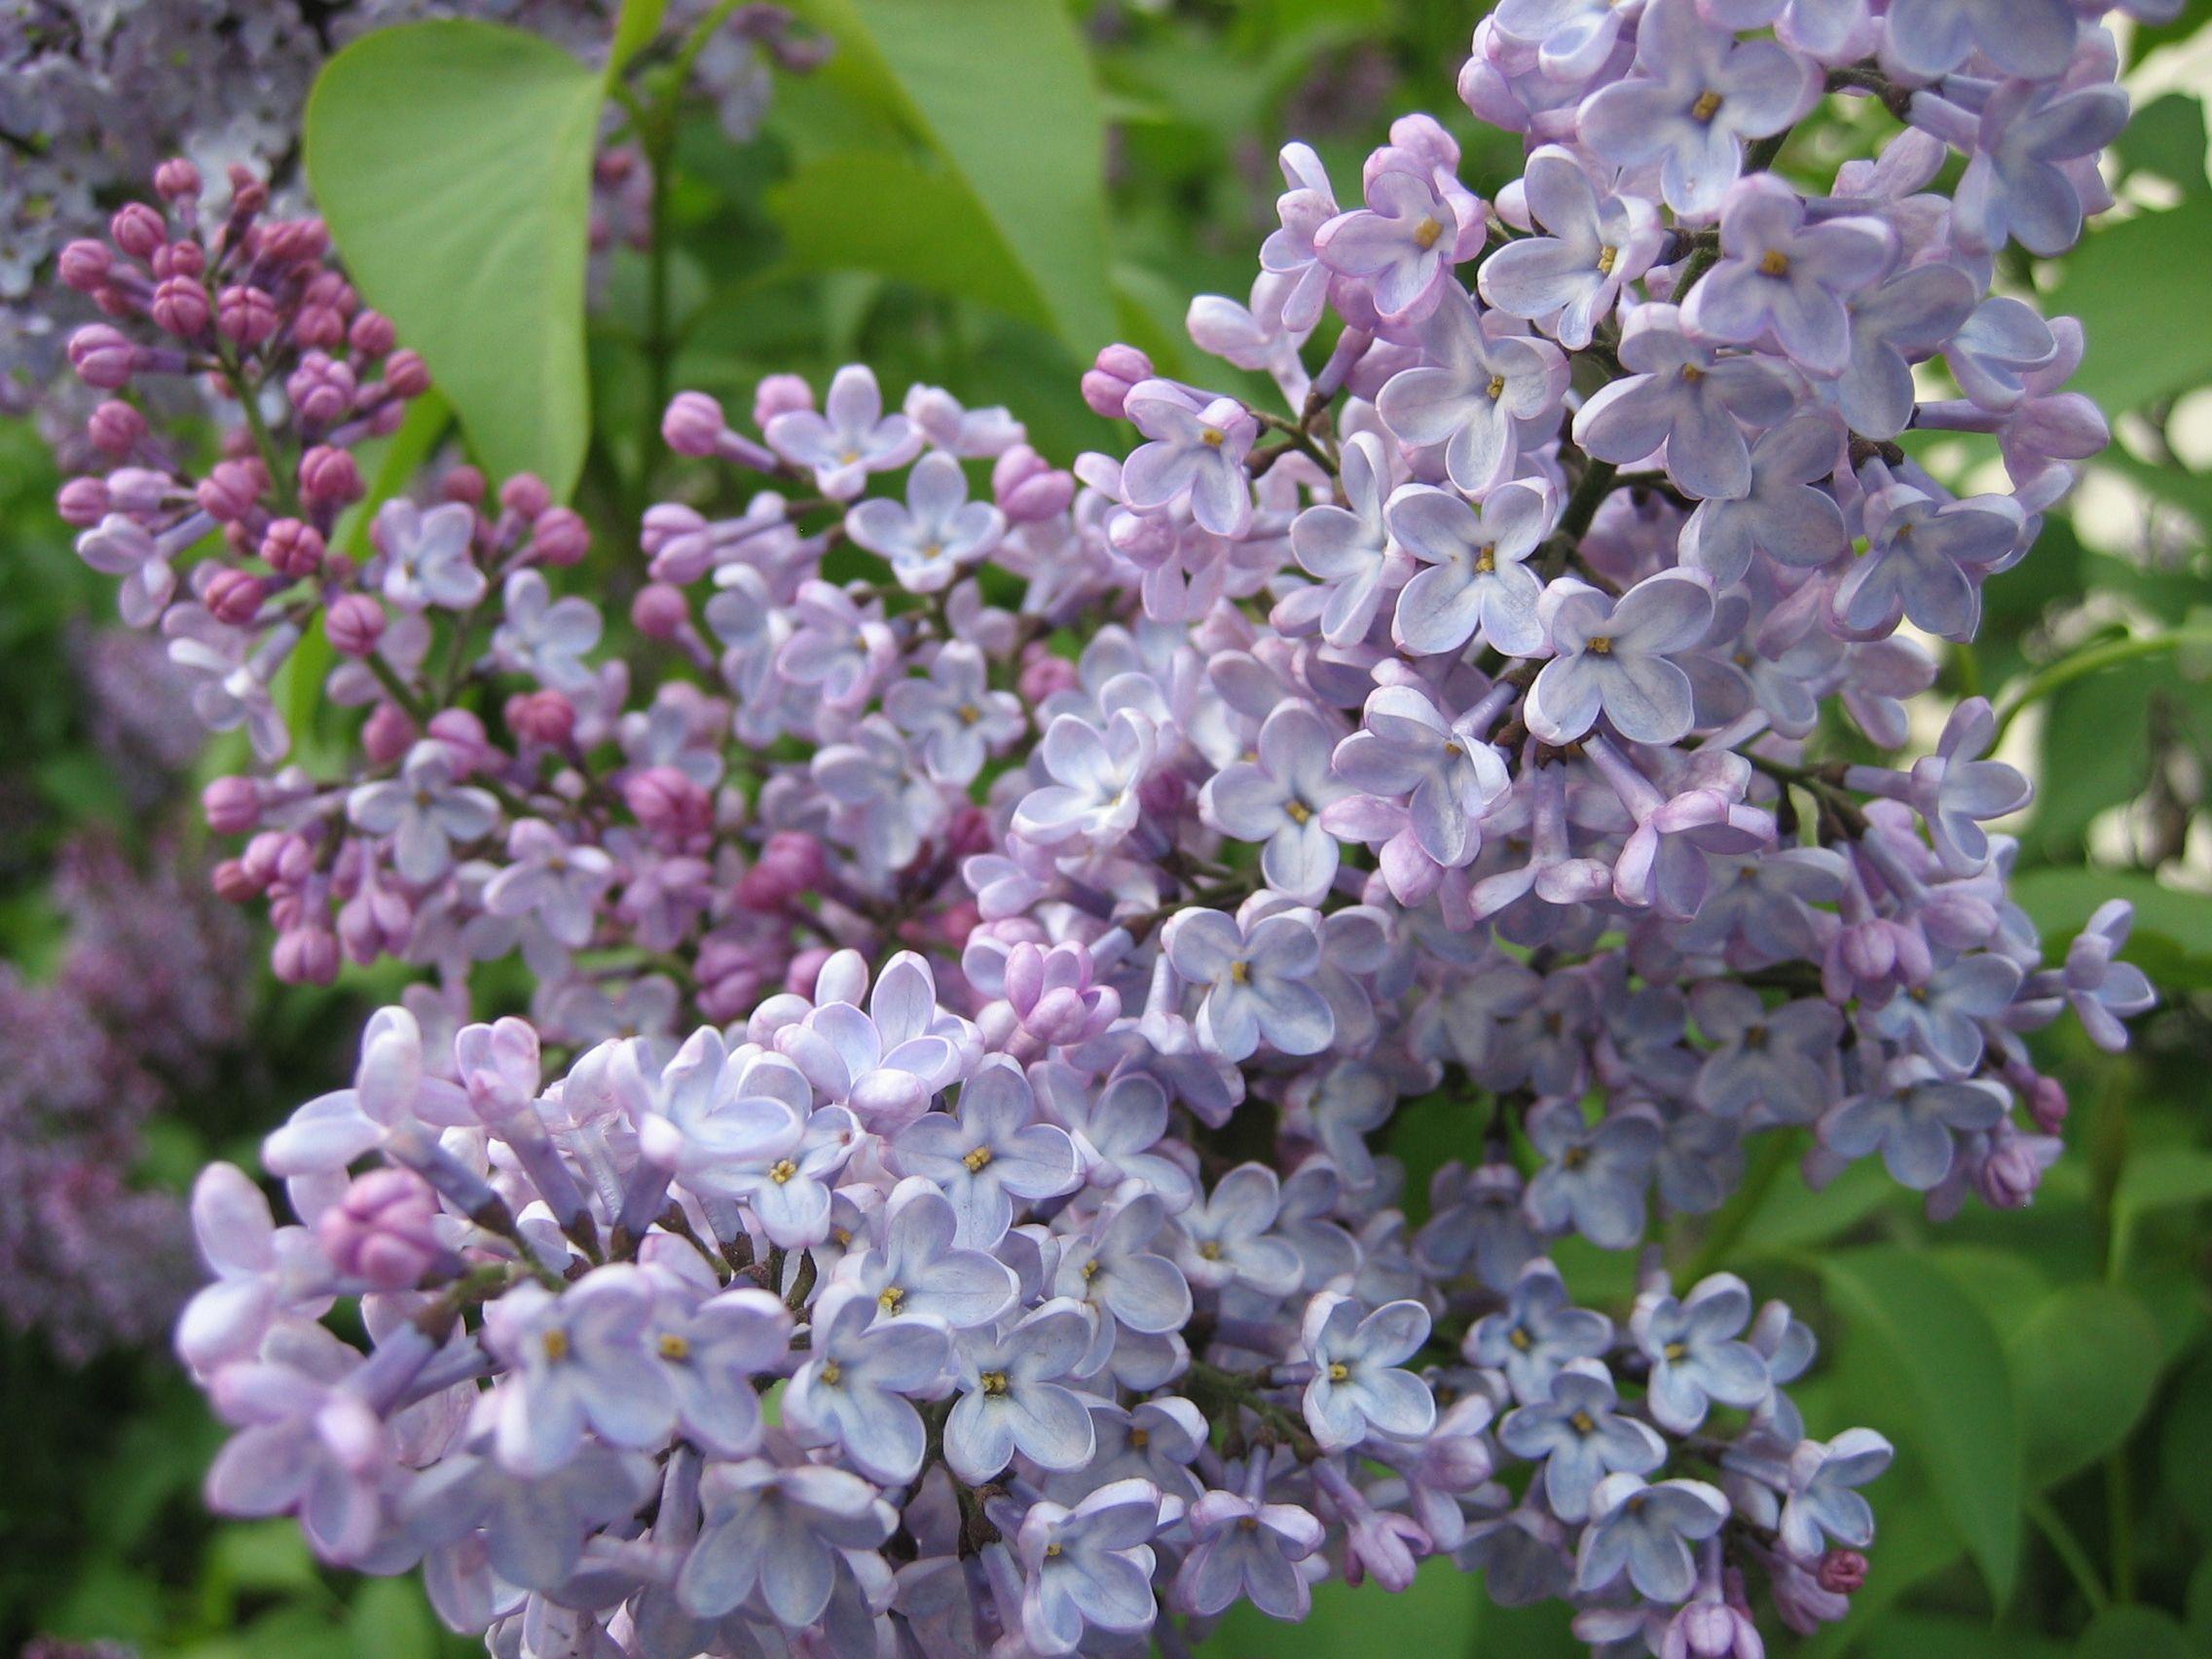 Syringa Wikipedia The Free Encyclopedia Lilac Gardening Lilac Flowers Lilac Bushes